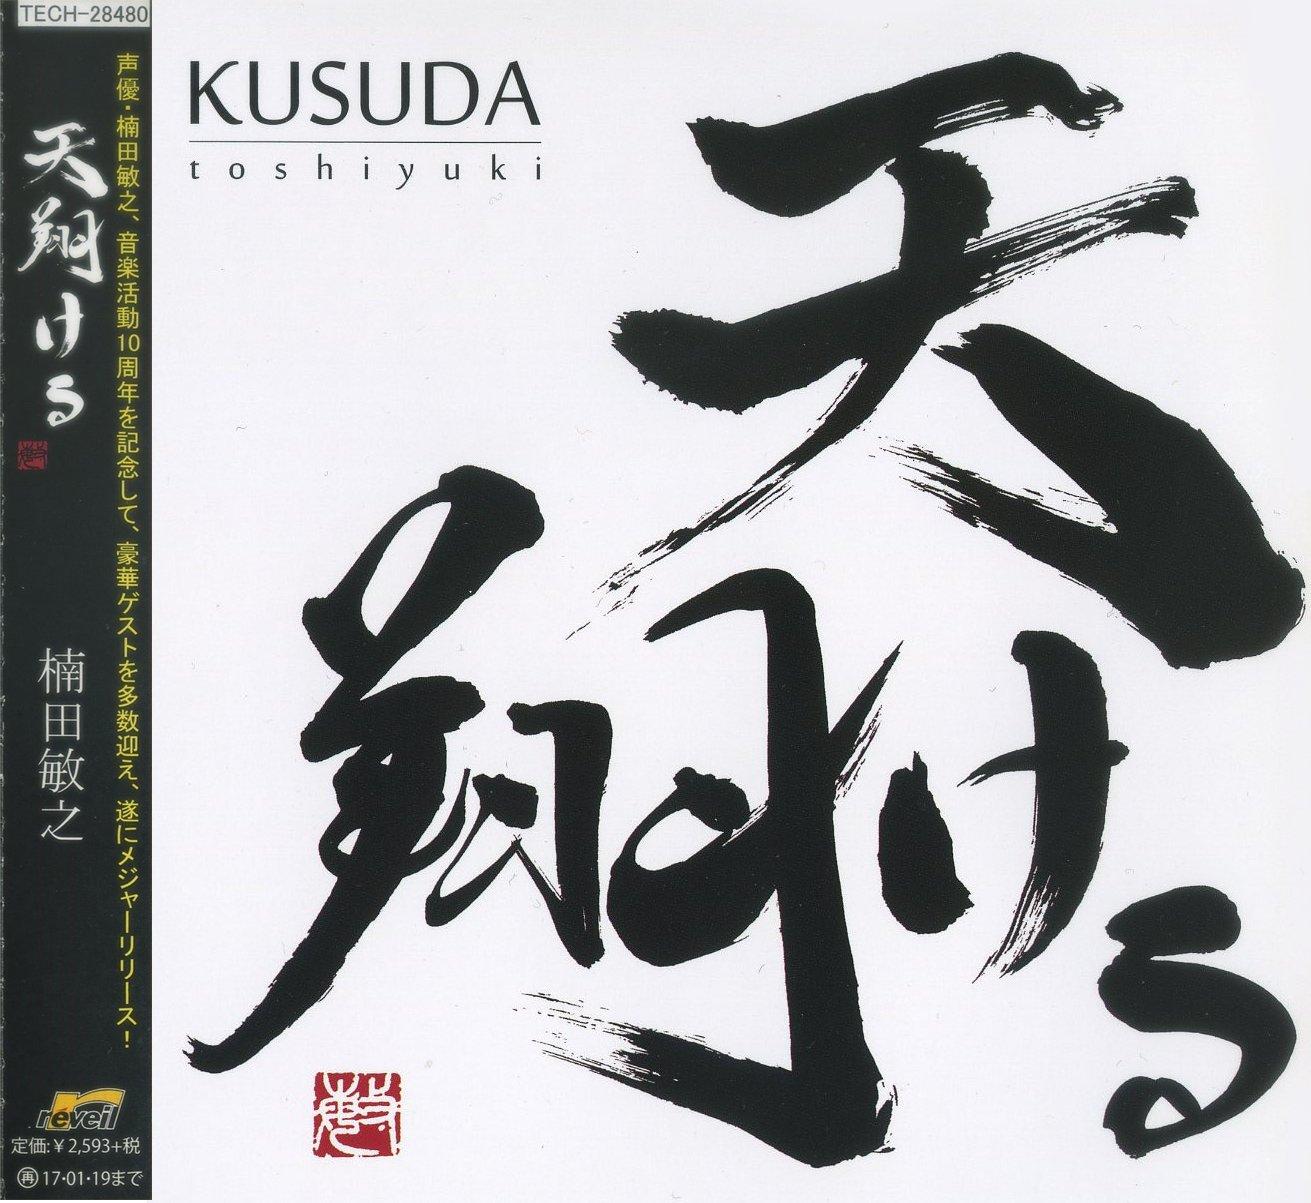 【10%OFF】CD『天翔ける』/楠田敏之画像